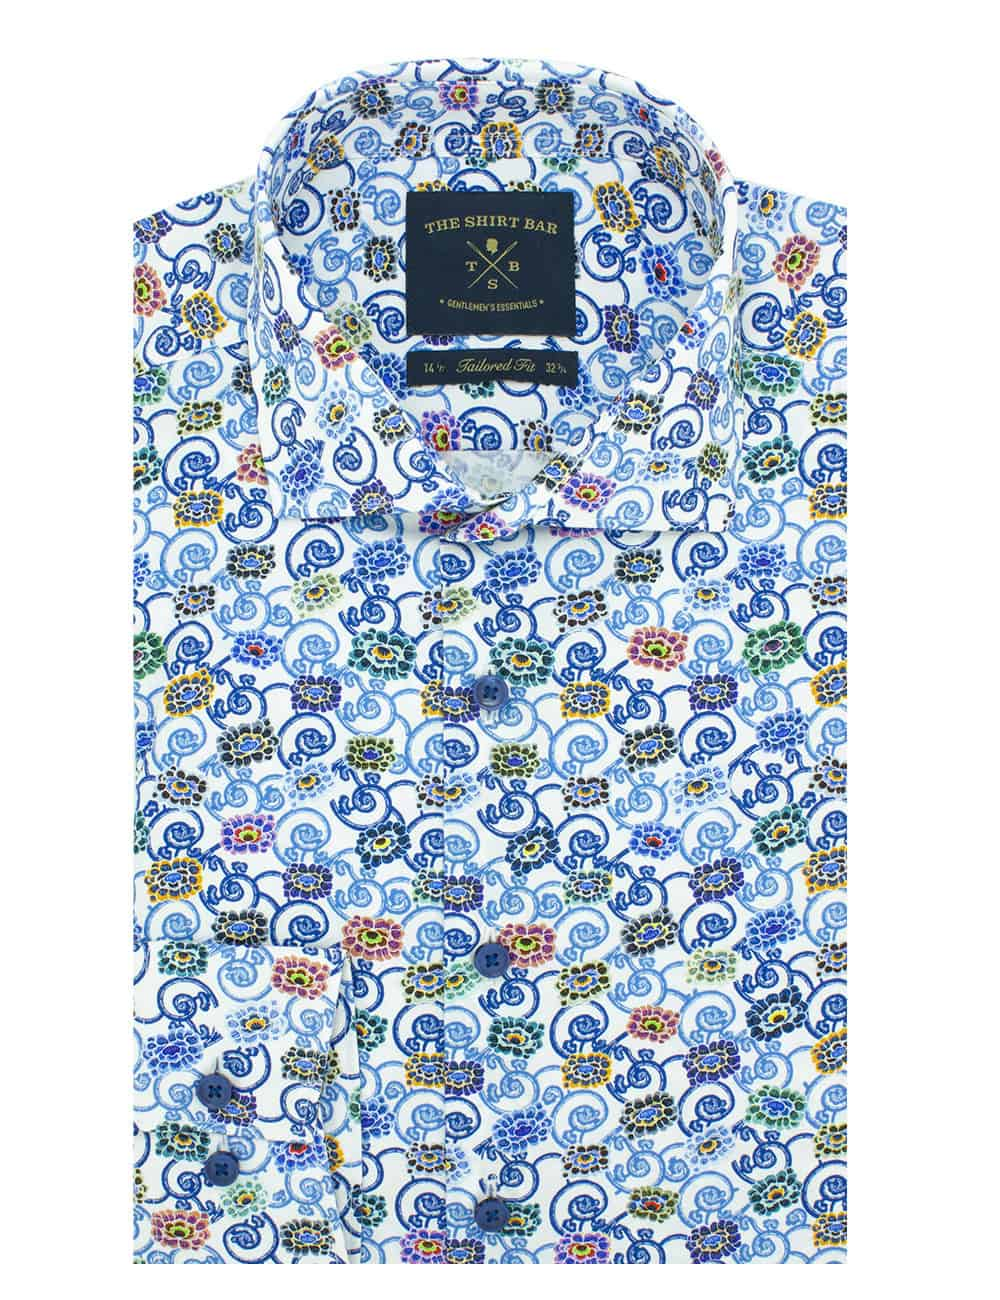 Tailored FitPremium Italian Fabric Digitally Printed Long Sleeve Single Cuff Men's Shirt